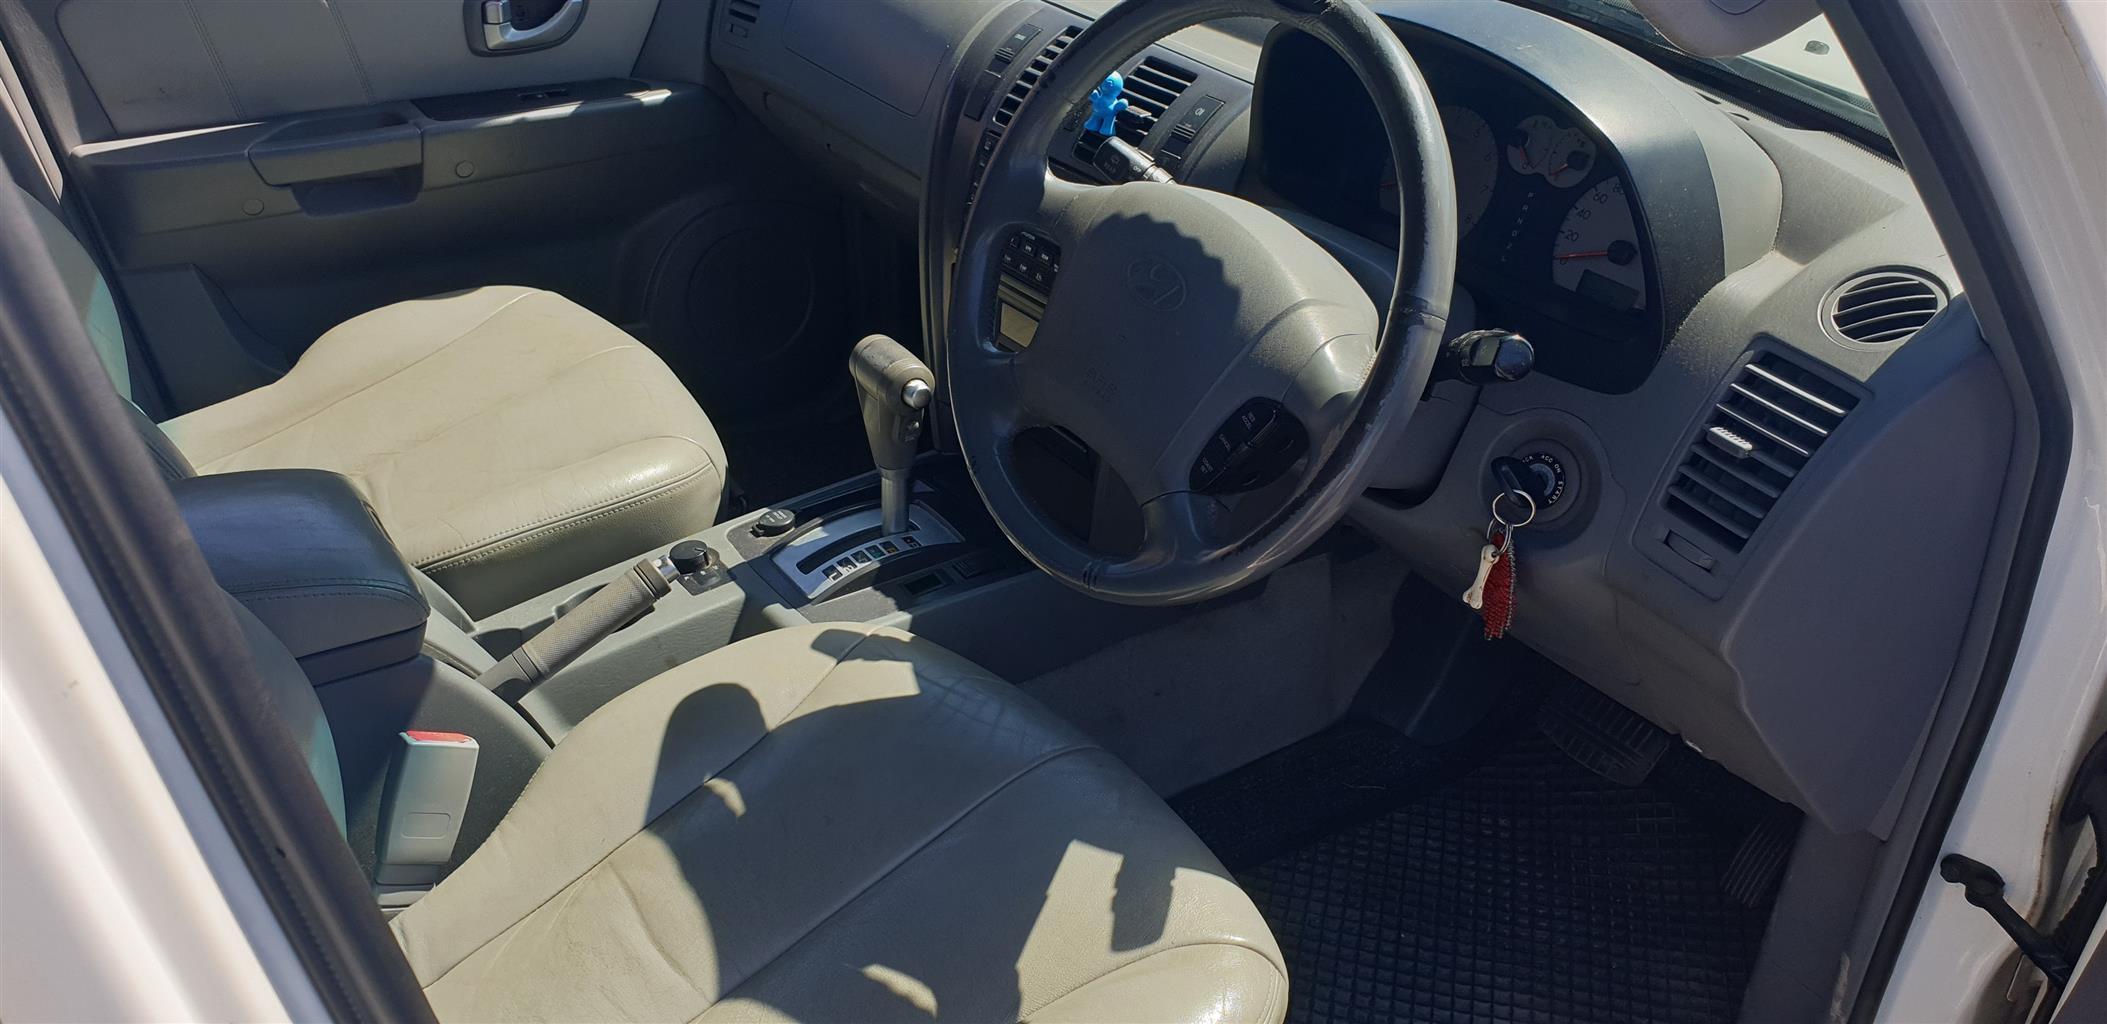 2007 Hyundai Terracan 3.5 V6 7 seater automatic